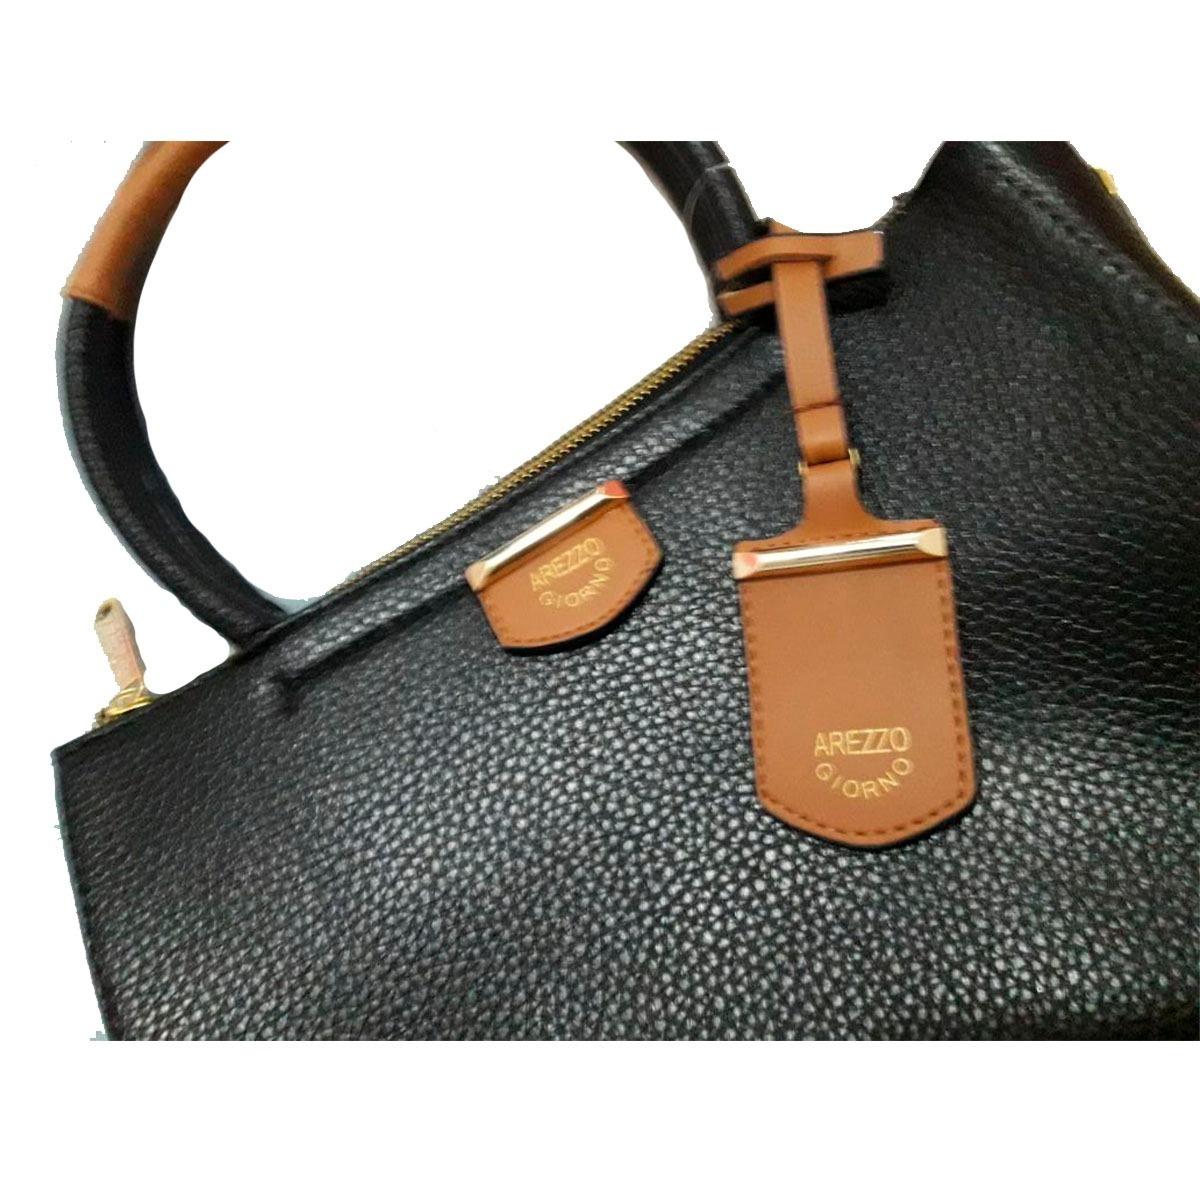 3f861365e bolsa feminina transversal arezzo giorno couro ecológico. Carregando zoom.